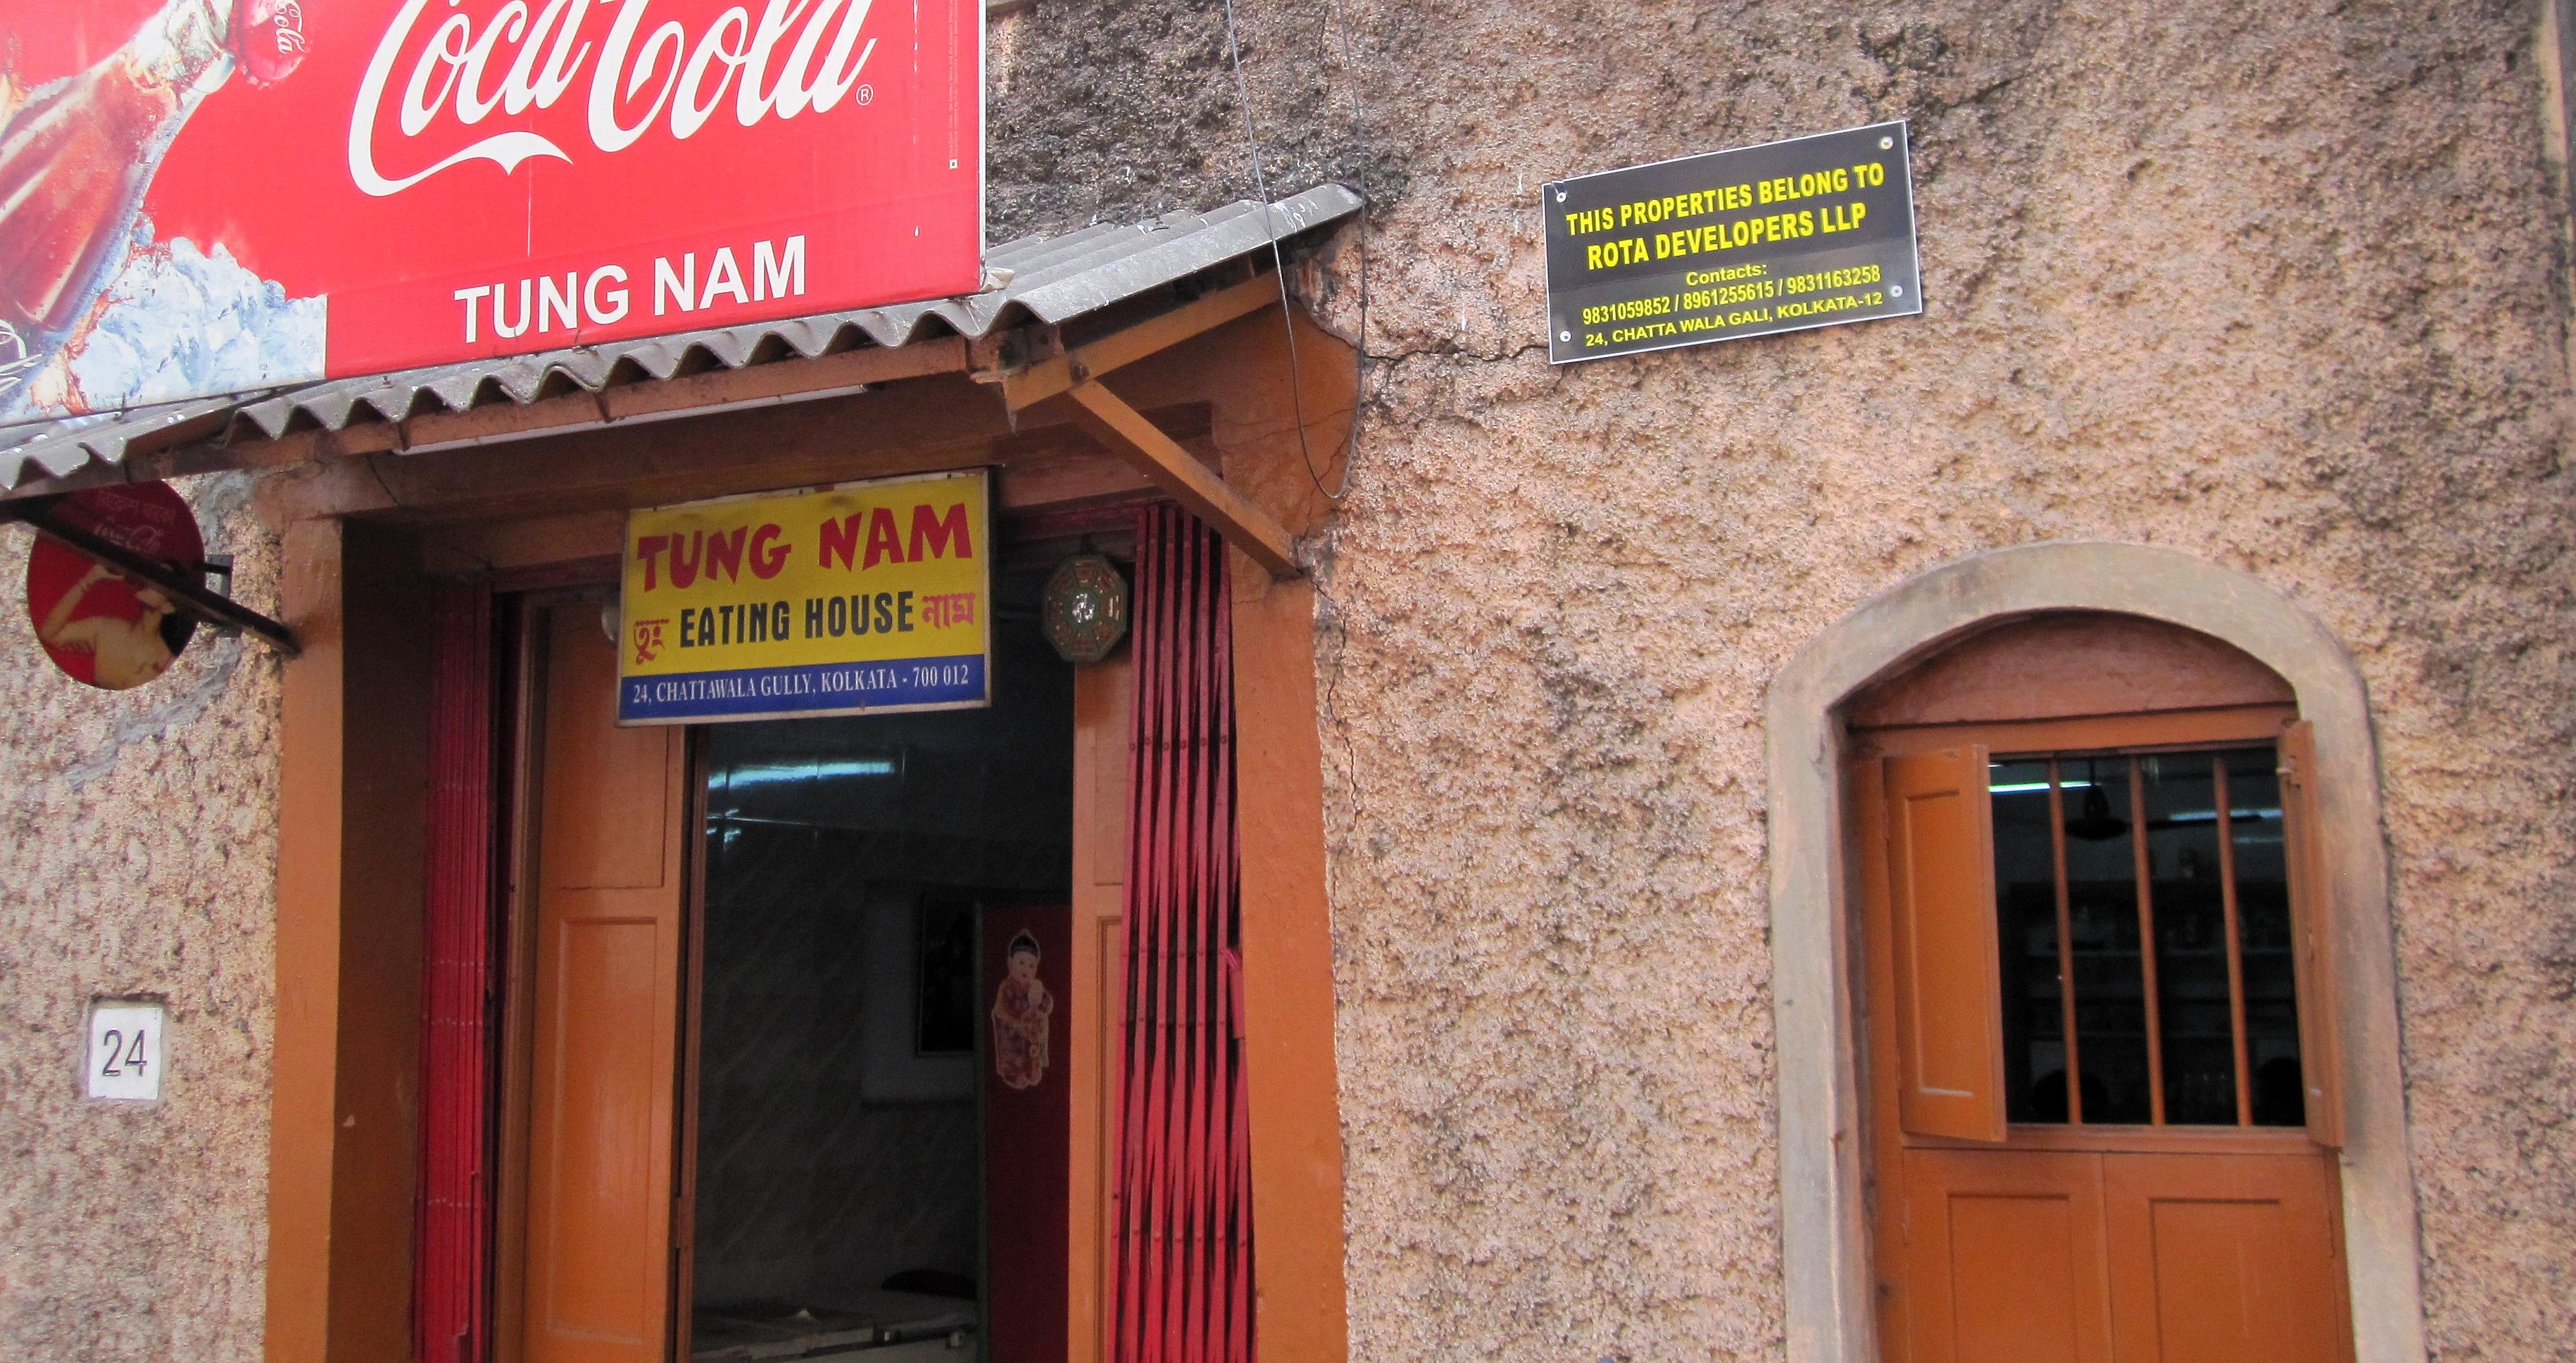 Det berömda gamla Tung Nam eating house. ©Zac O'Yeah